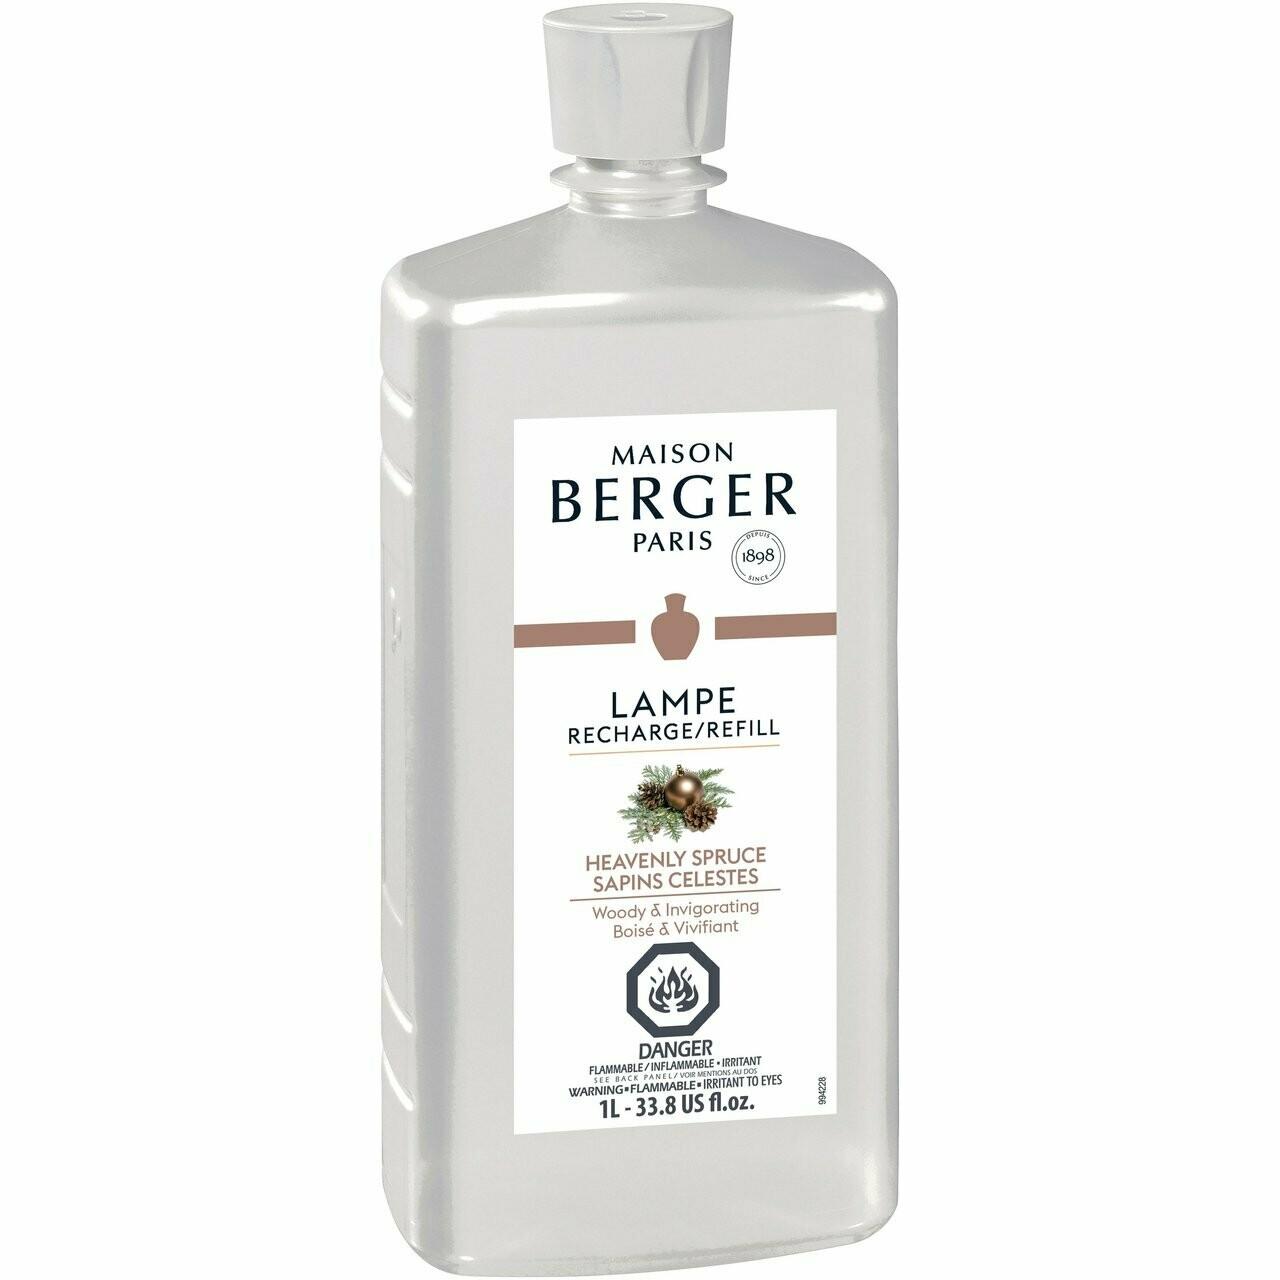 Heavenly Spruce 500 ml Fragrance